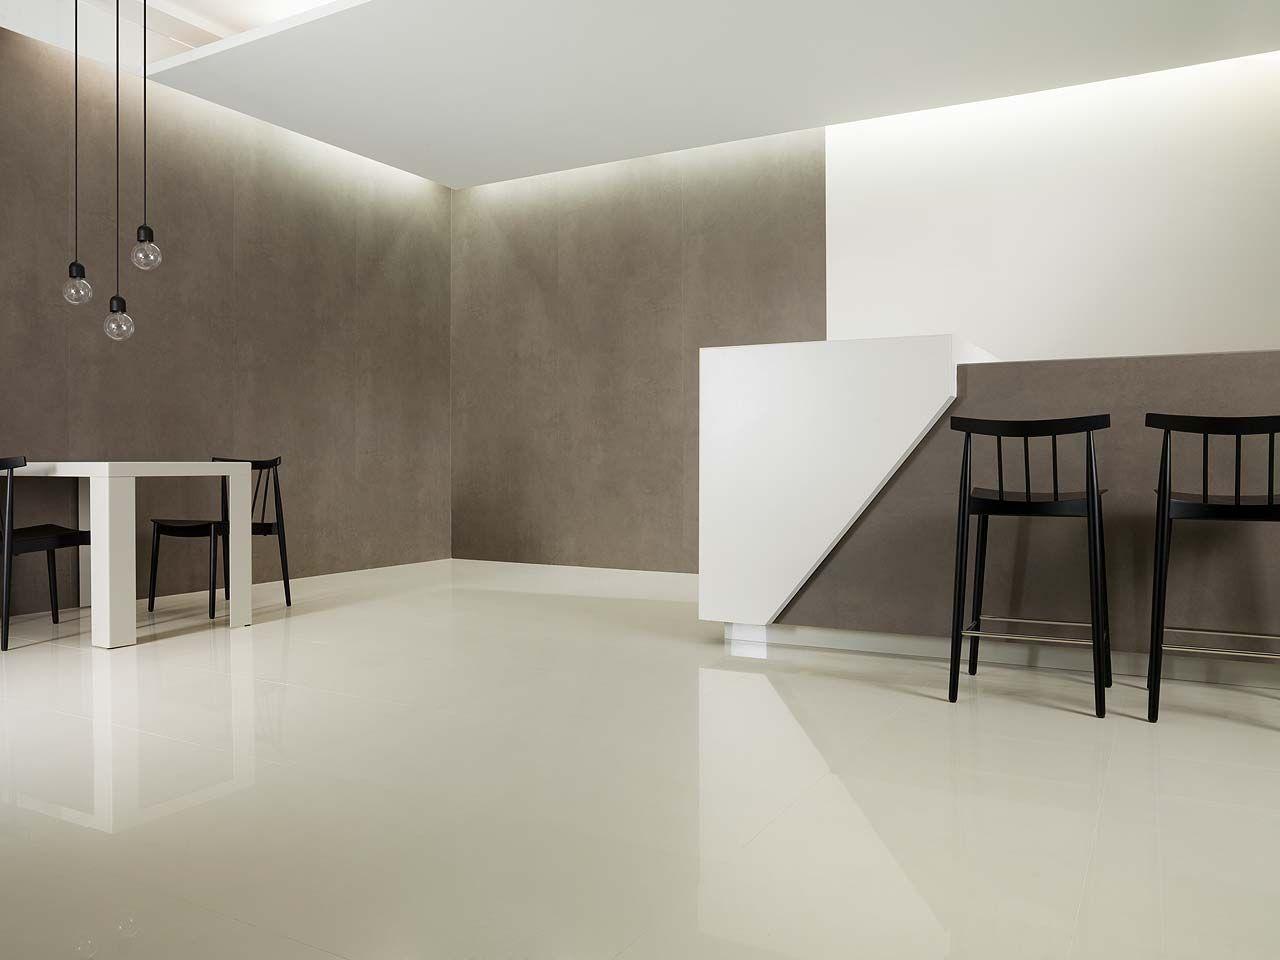 Town white polished 60 x 60 cm floor bathroom inspirational ideas porcelain tiles porcelain floor tiles dailygadgetfo Choice Image